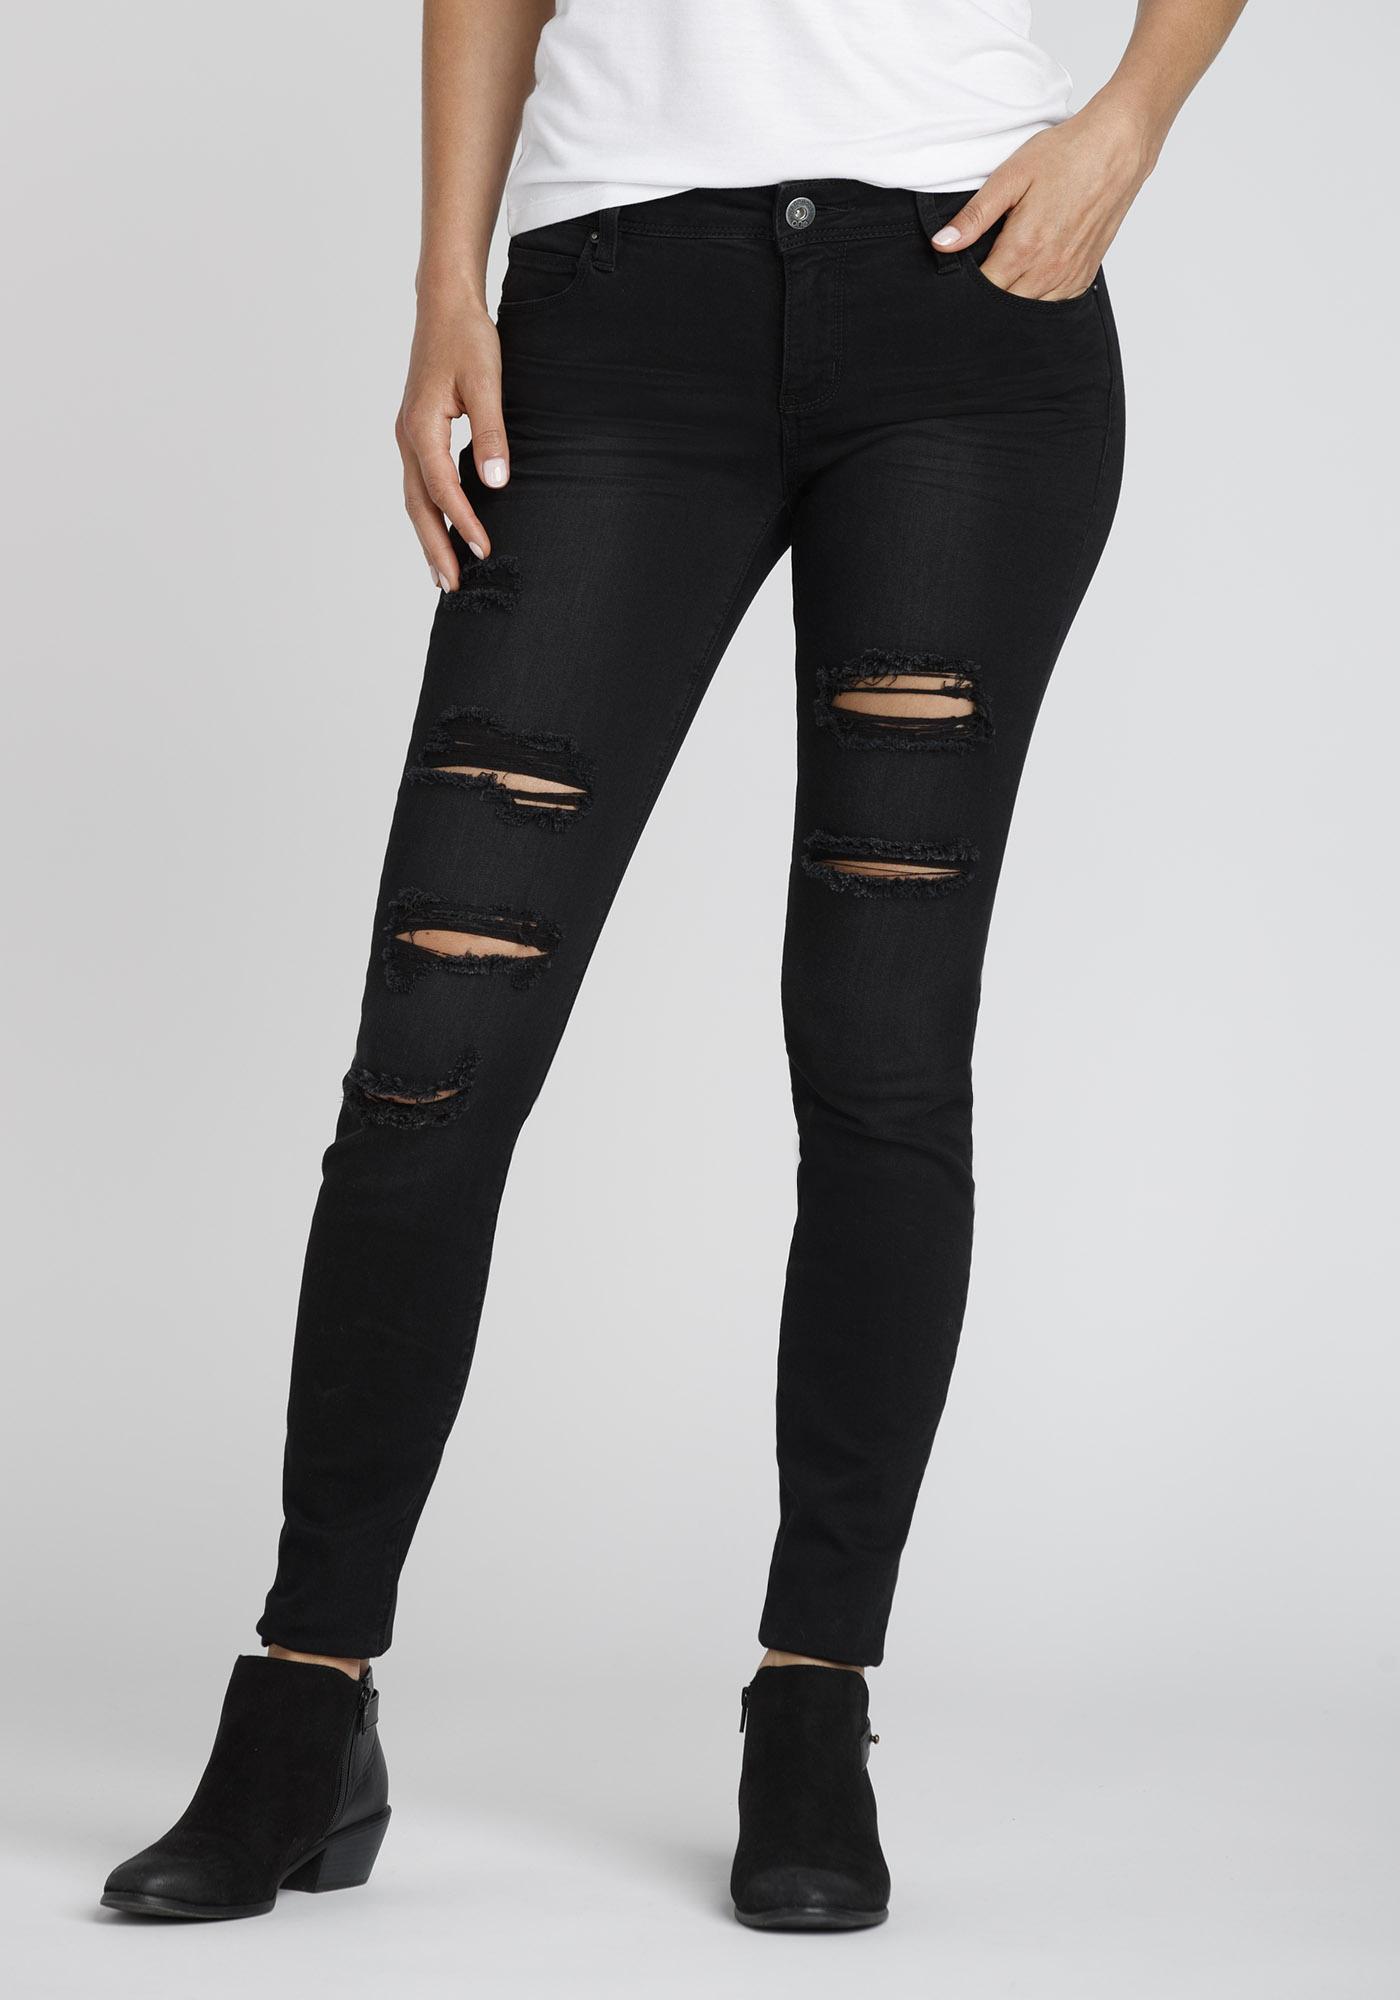 b79494ffb24f3a Womens Black Ripped Skinny Jeans, BLACK, hi-res ...